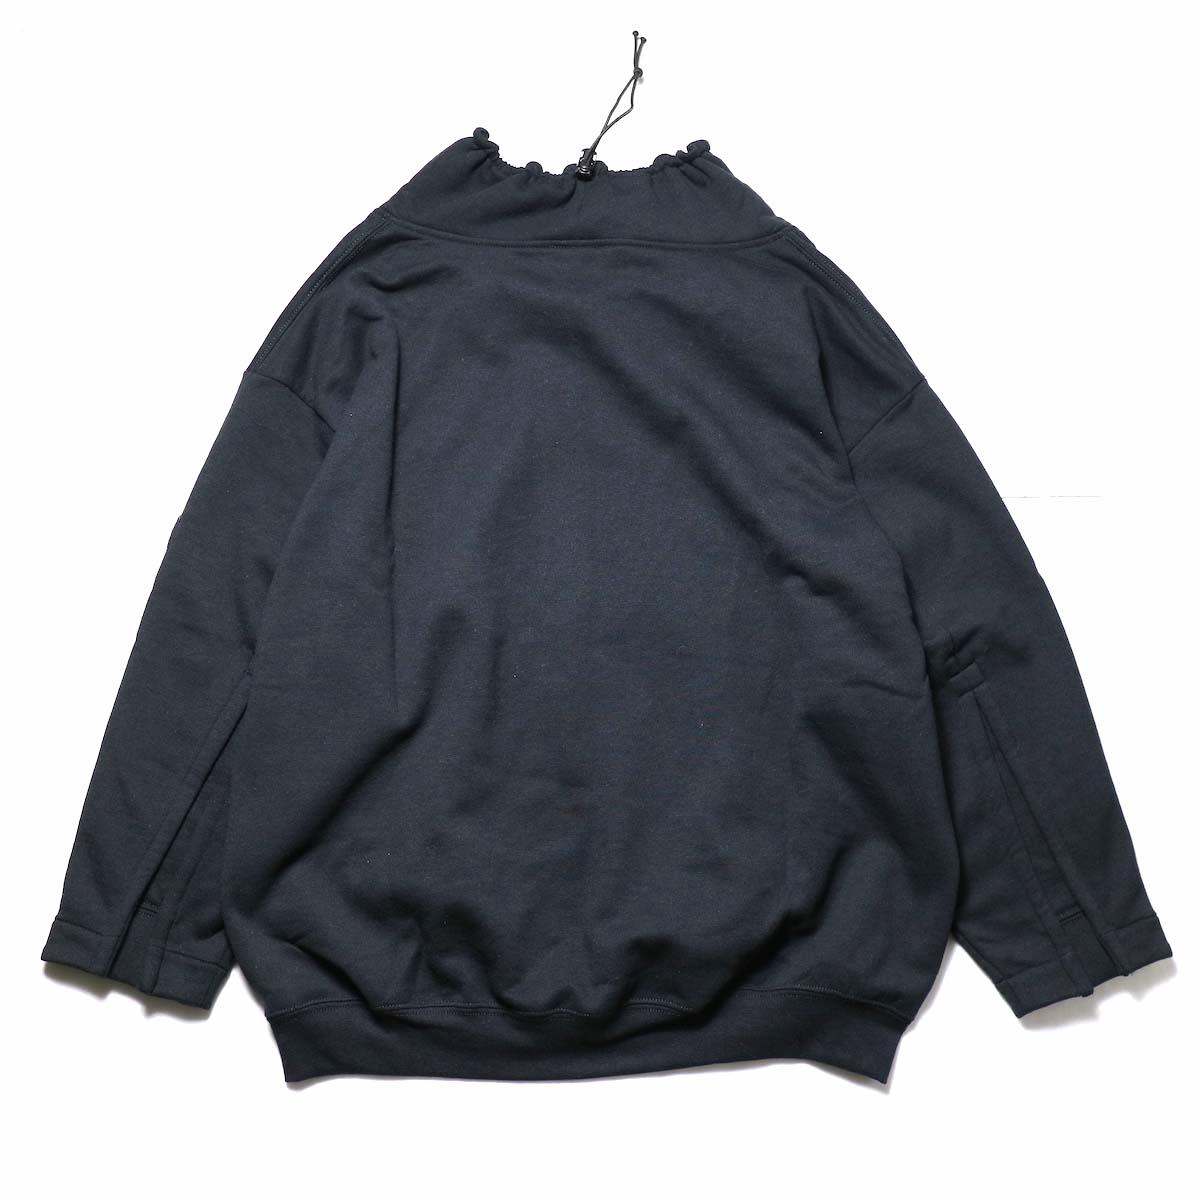 PRE_ / FG SWEAT (Black)背面